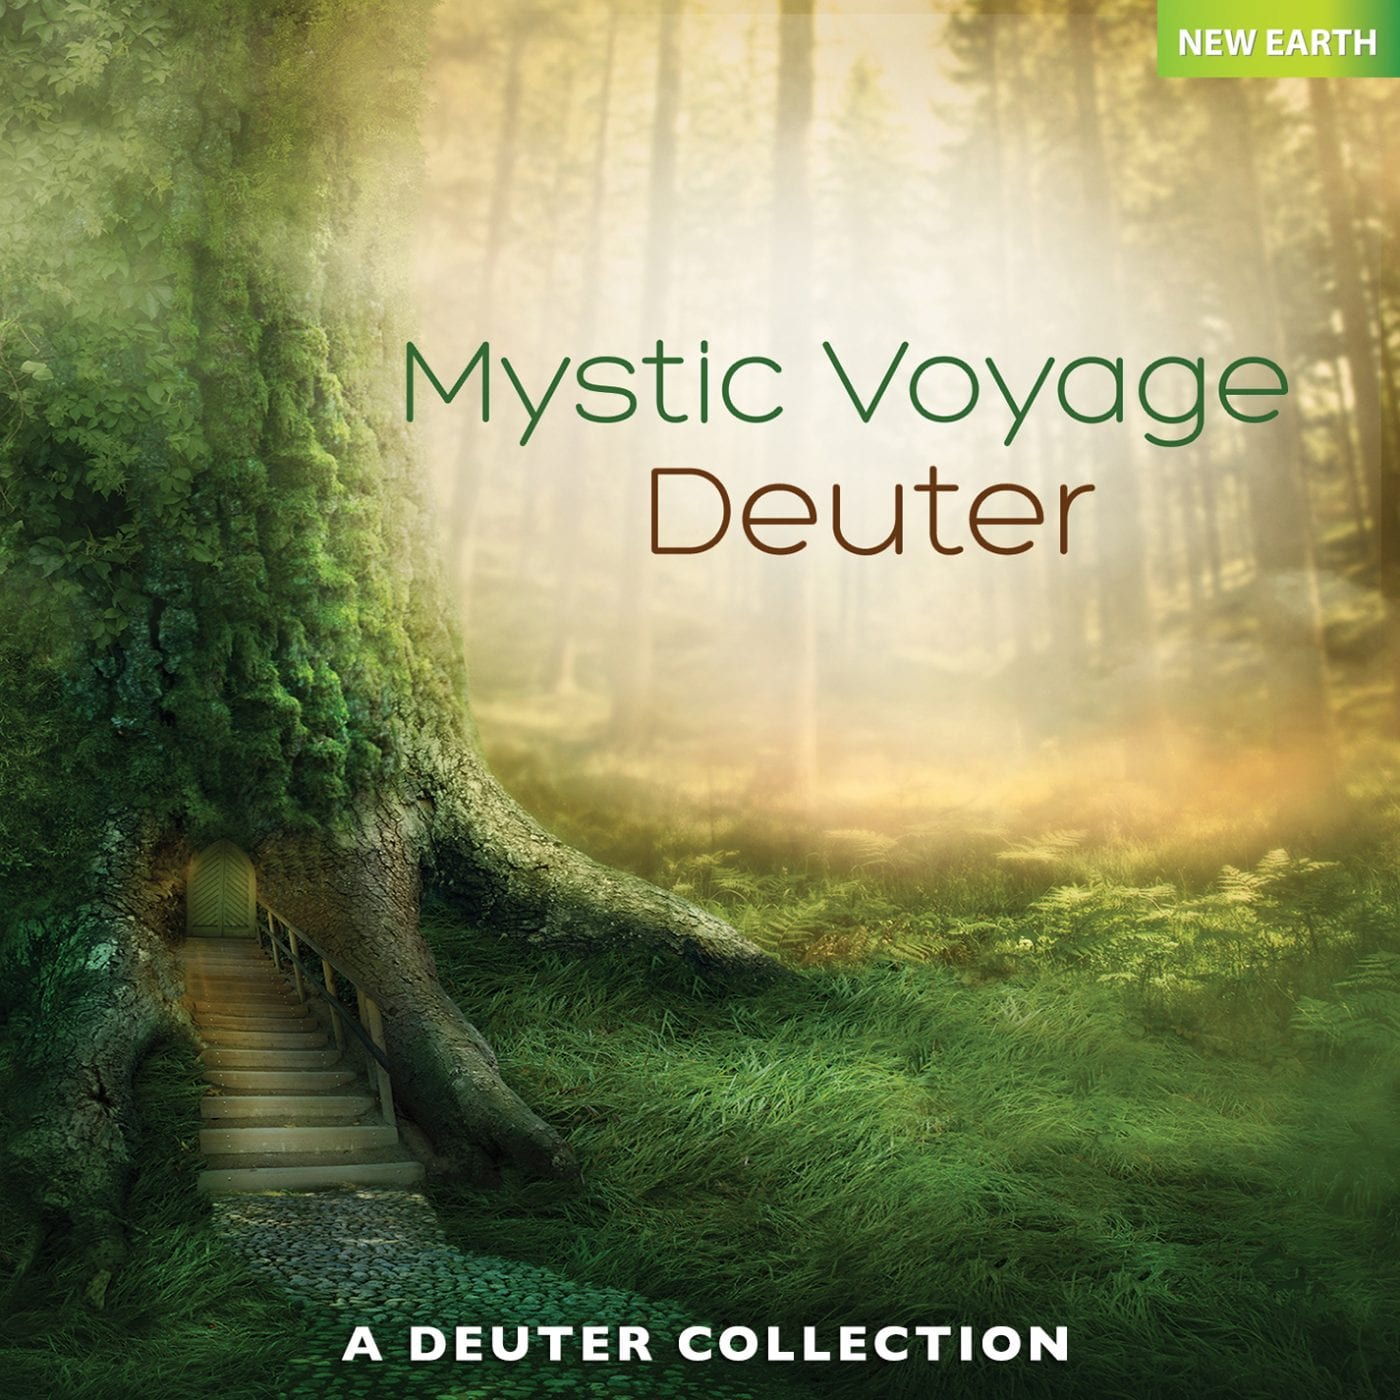 Mystic Voyage Deuter Compilation